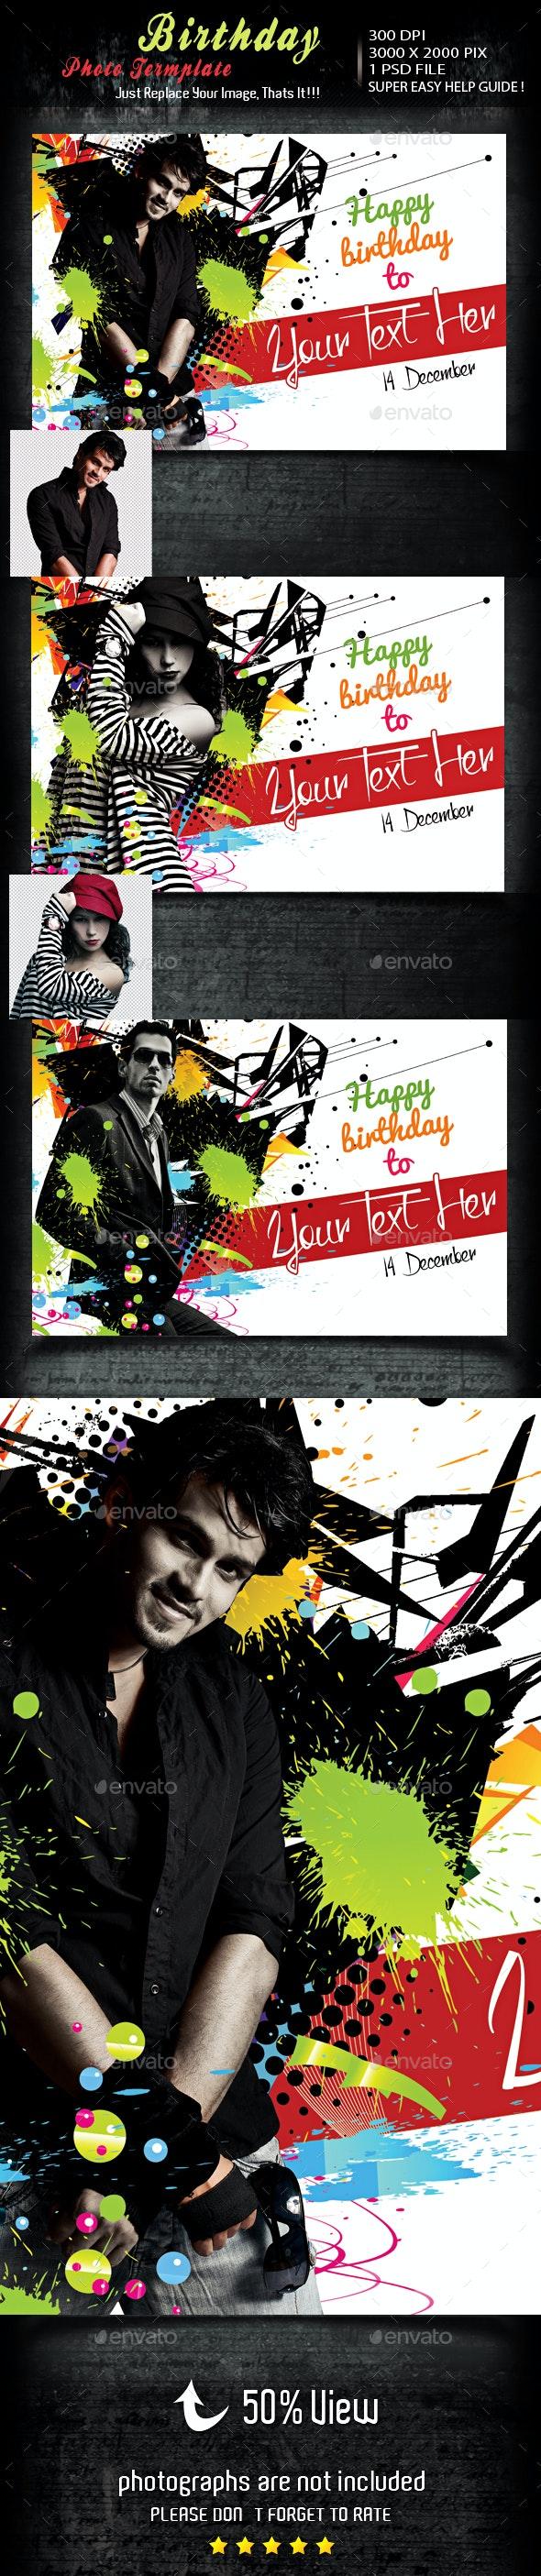 Birthday Photo Template - Photo Templates Graphics